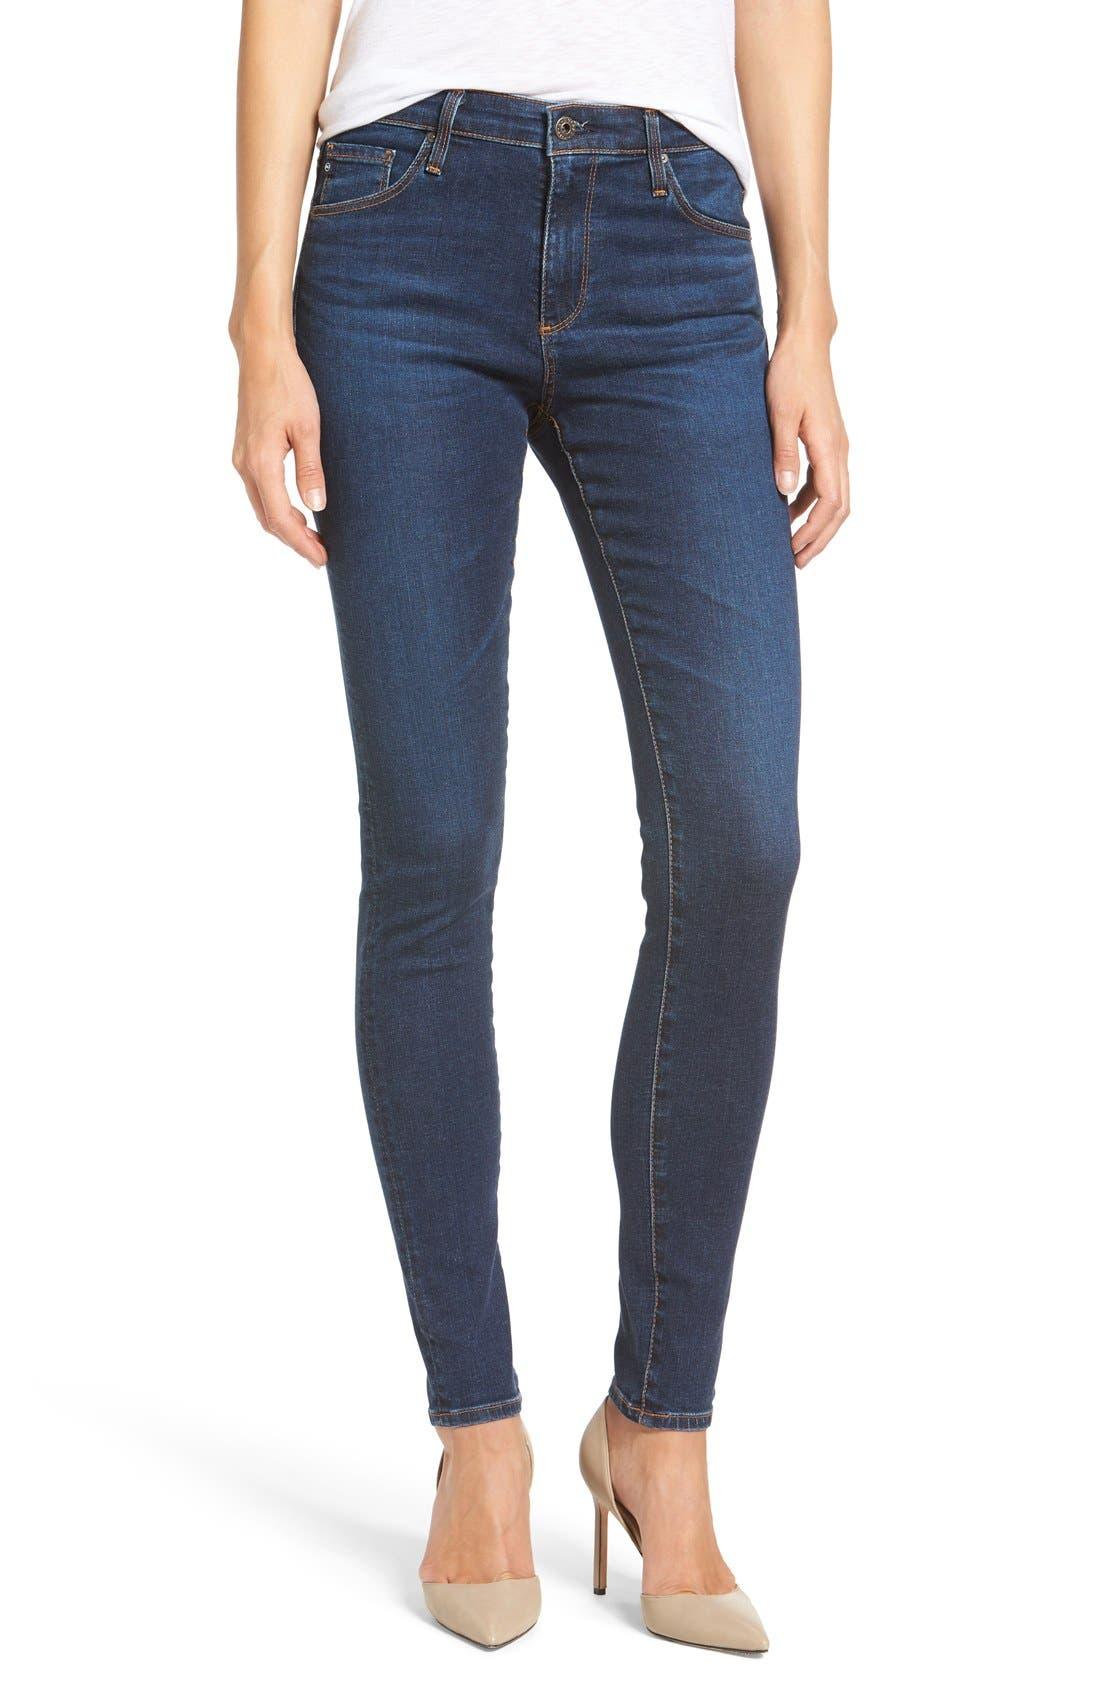 'The Farrah' High Rise Skinny Jeans,                             Alternate thumbnail 20, color,